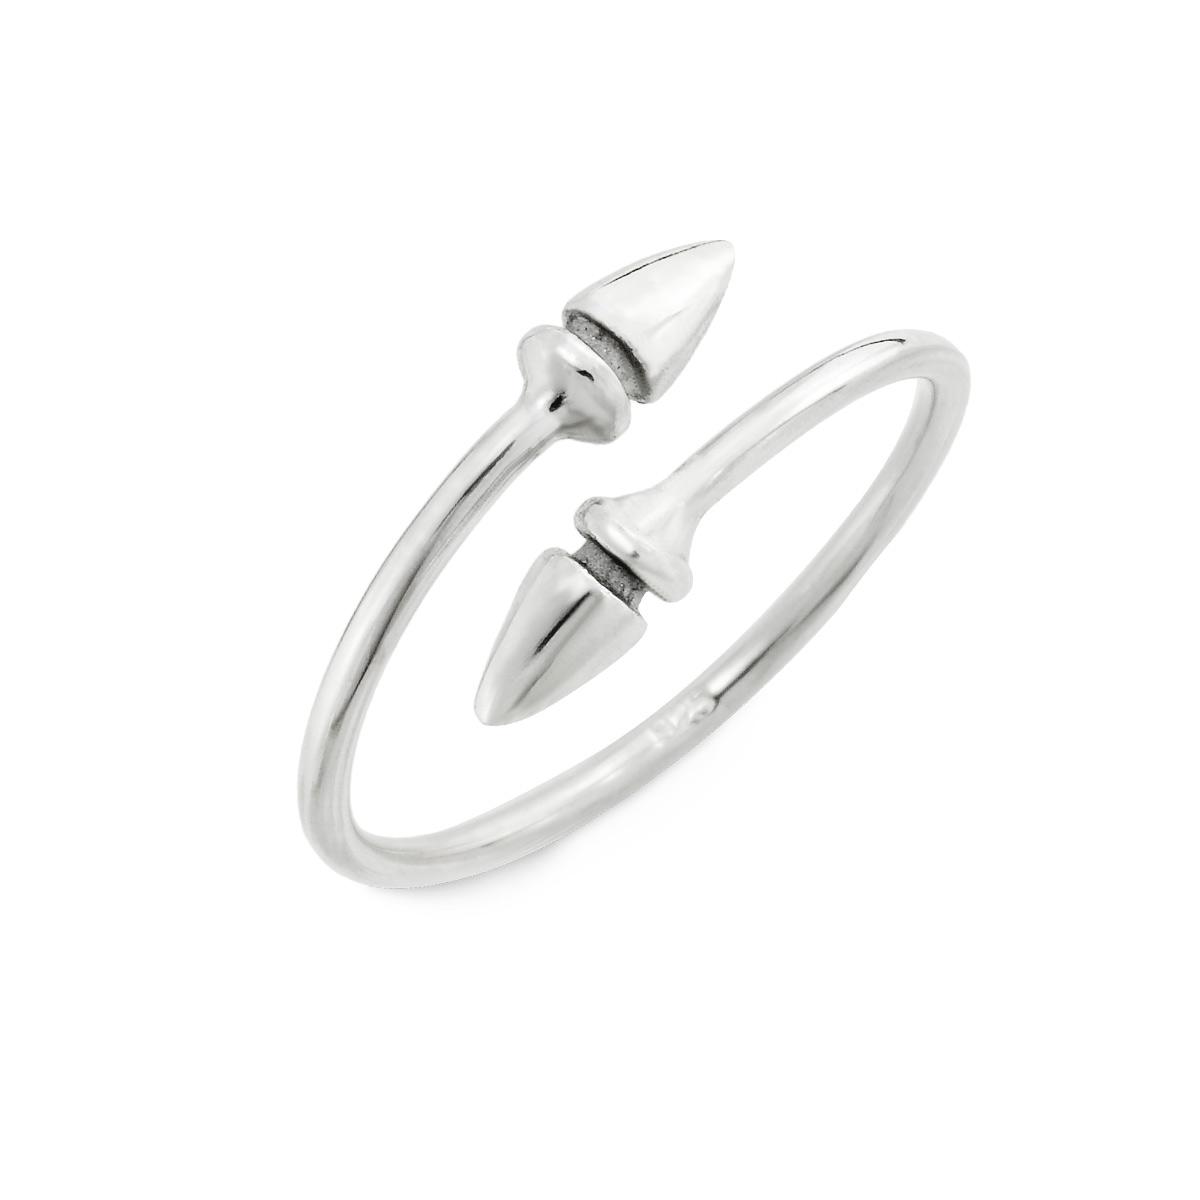 KSW309 雙箭個性姊妹戒指